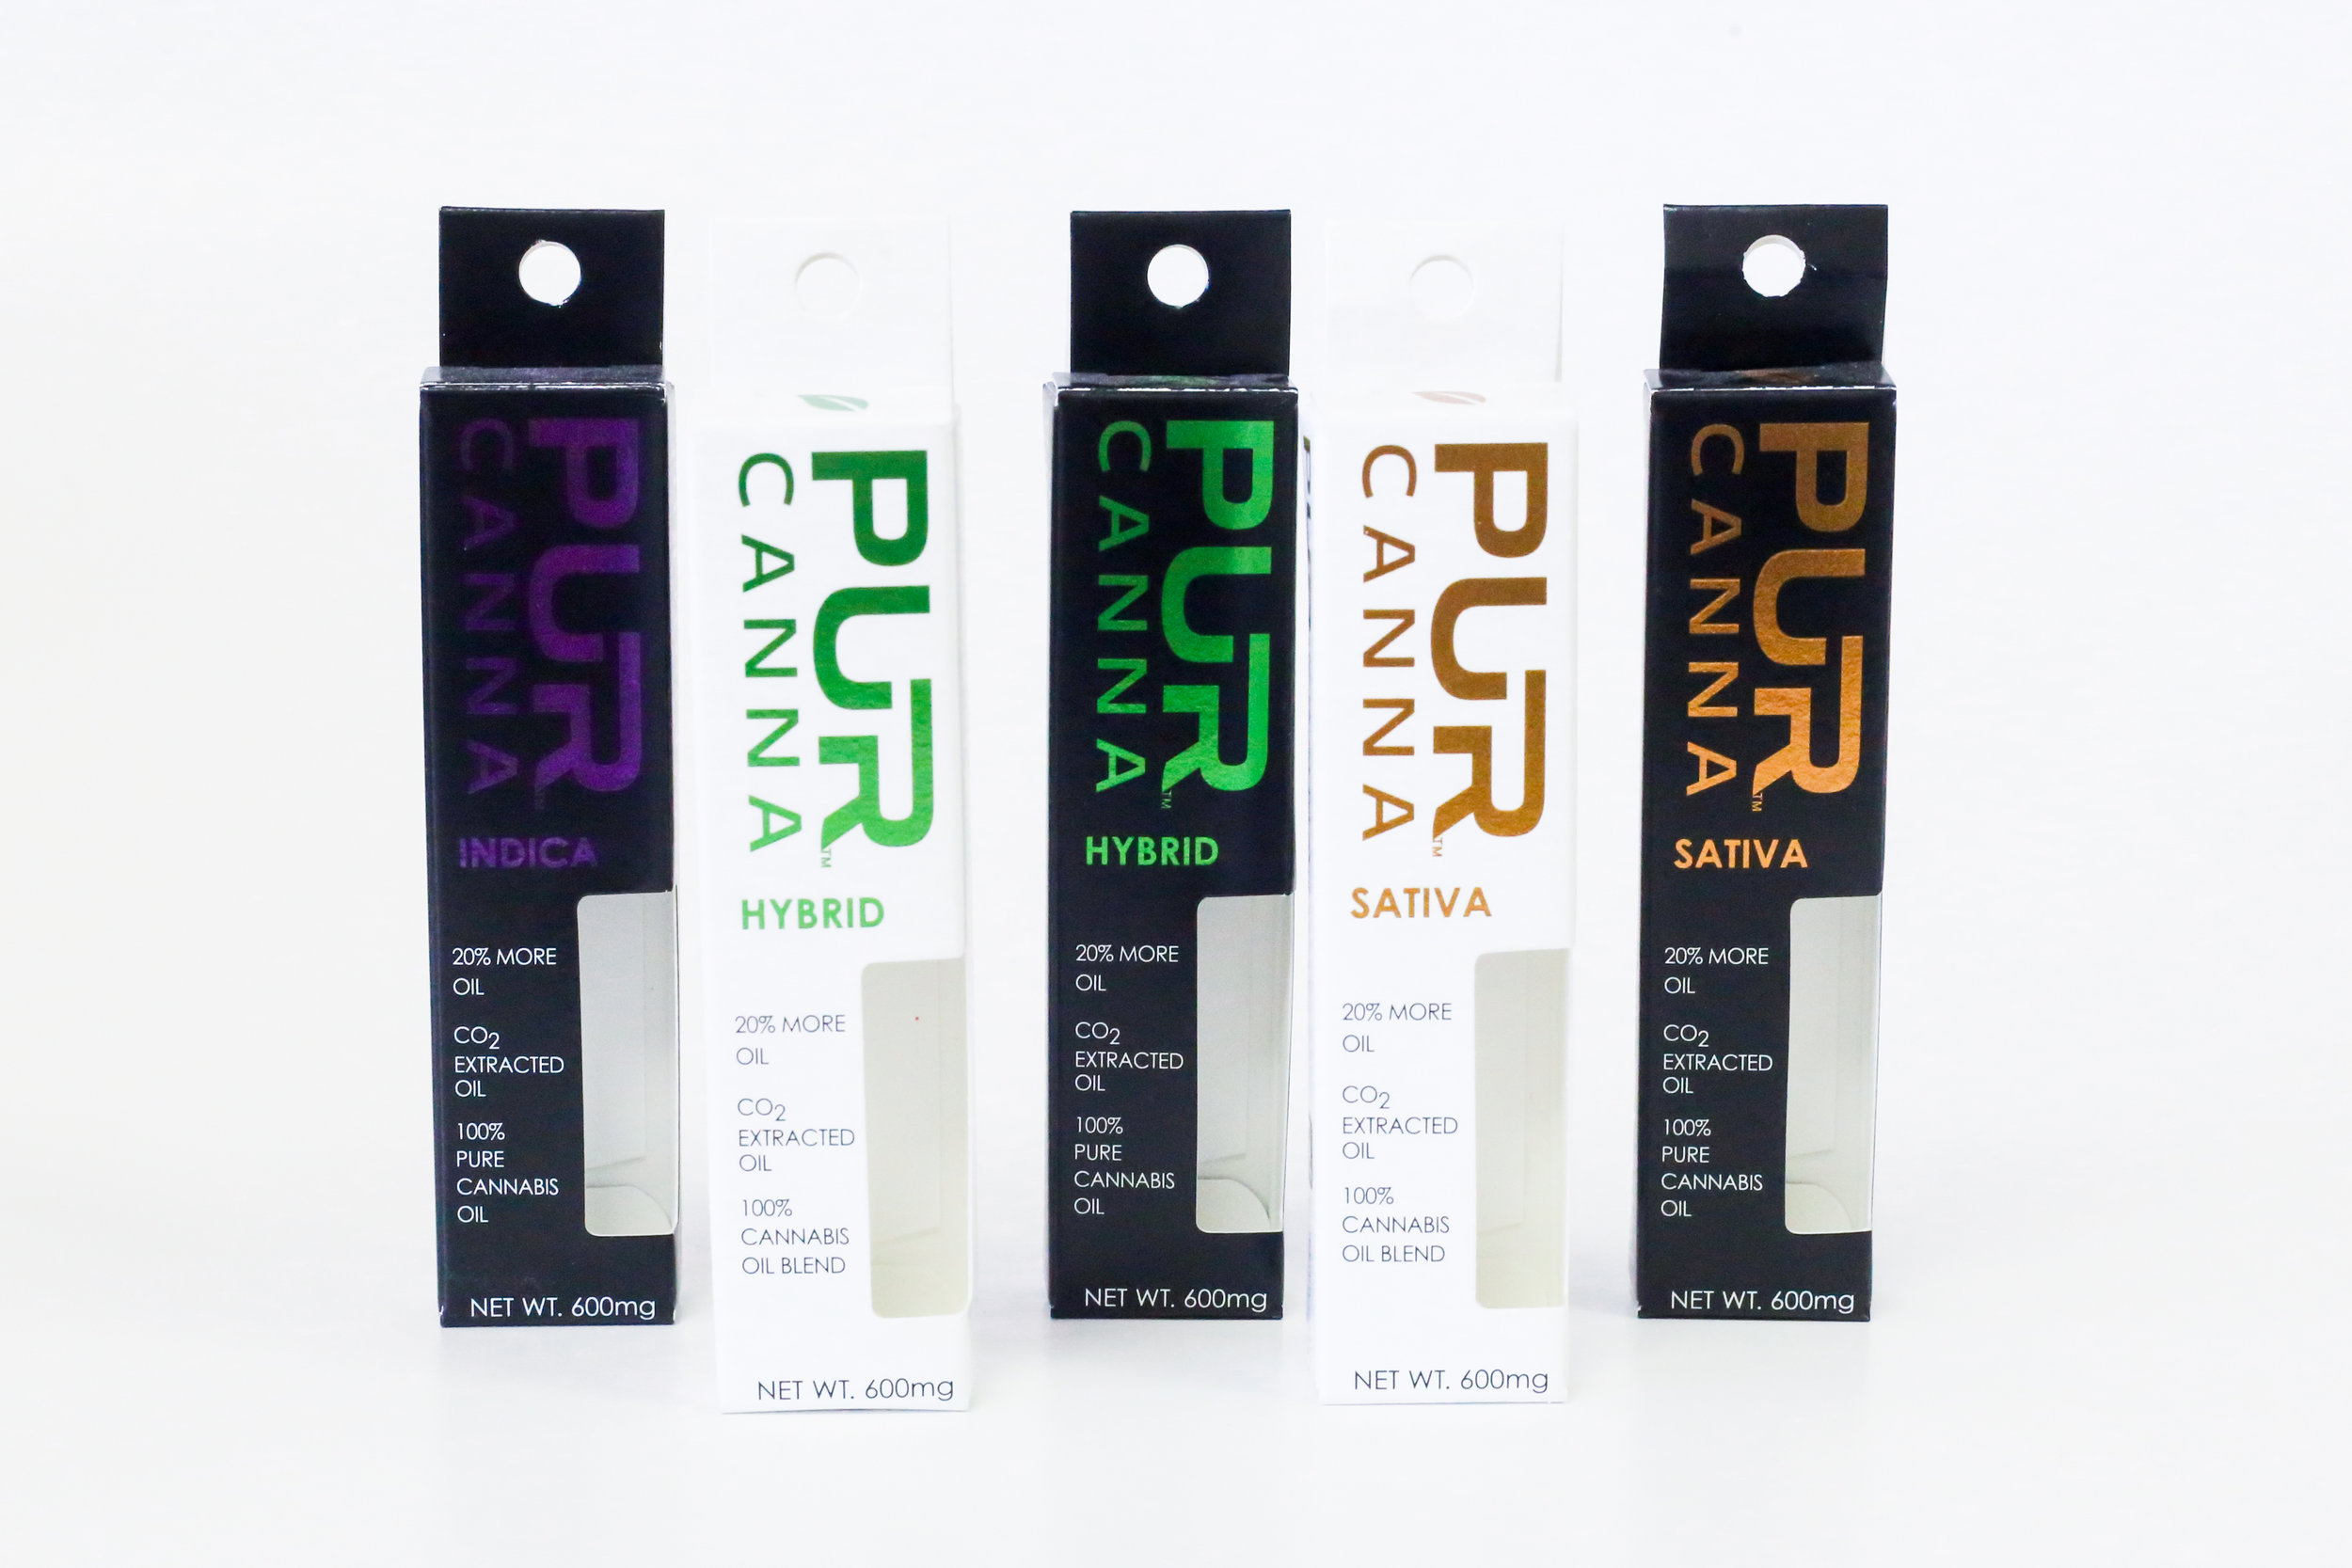 Pur Canna Vaporizer Cannabis Packaging